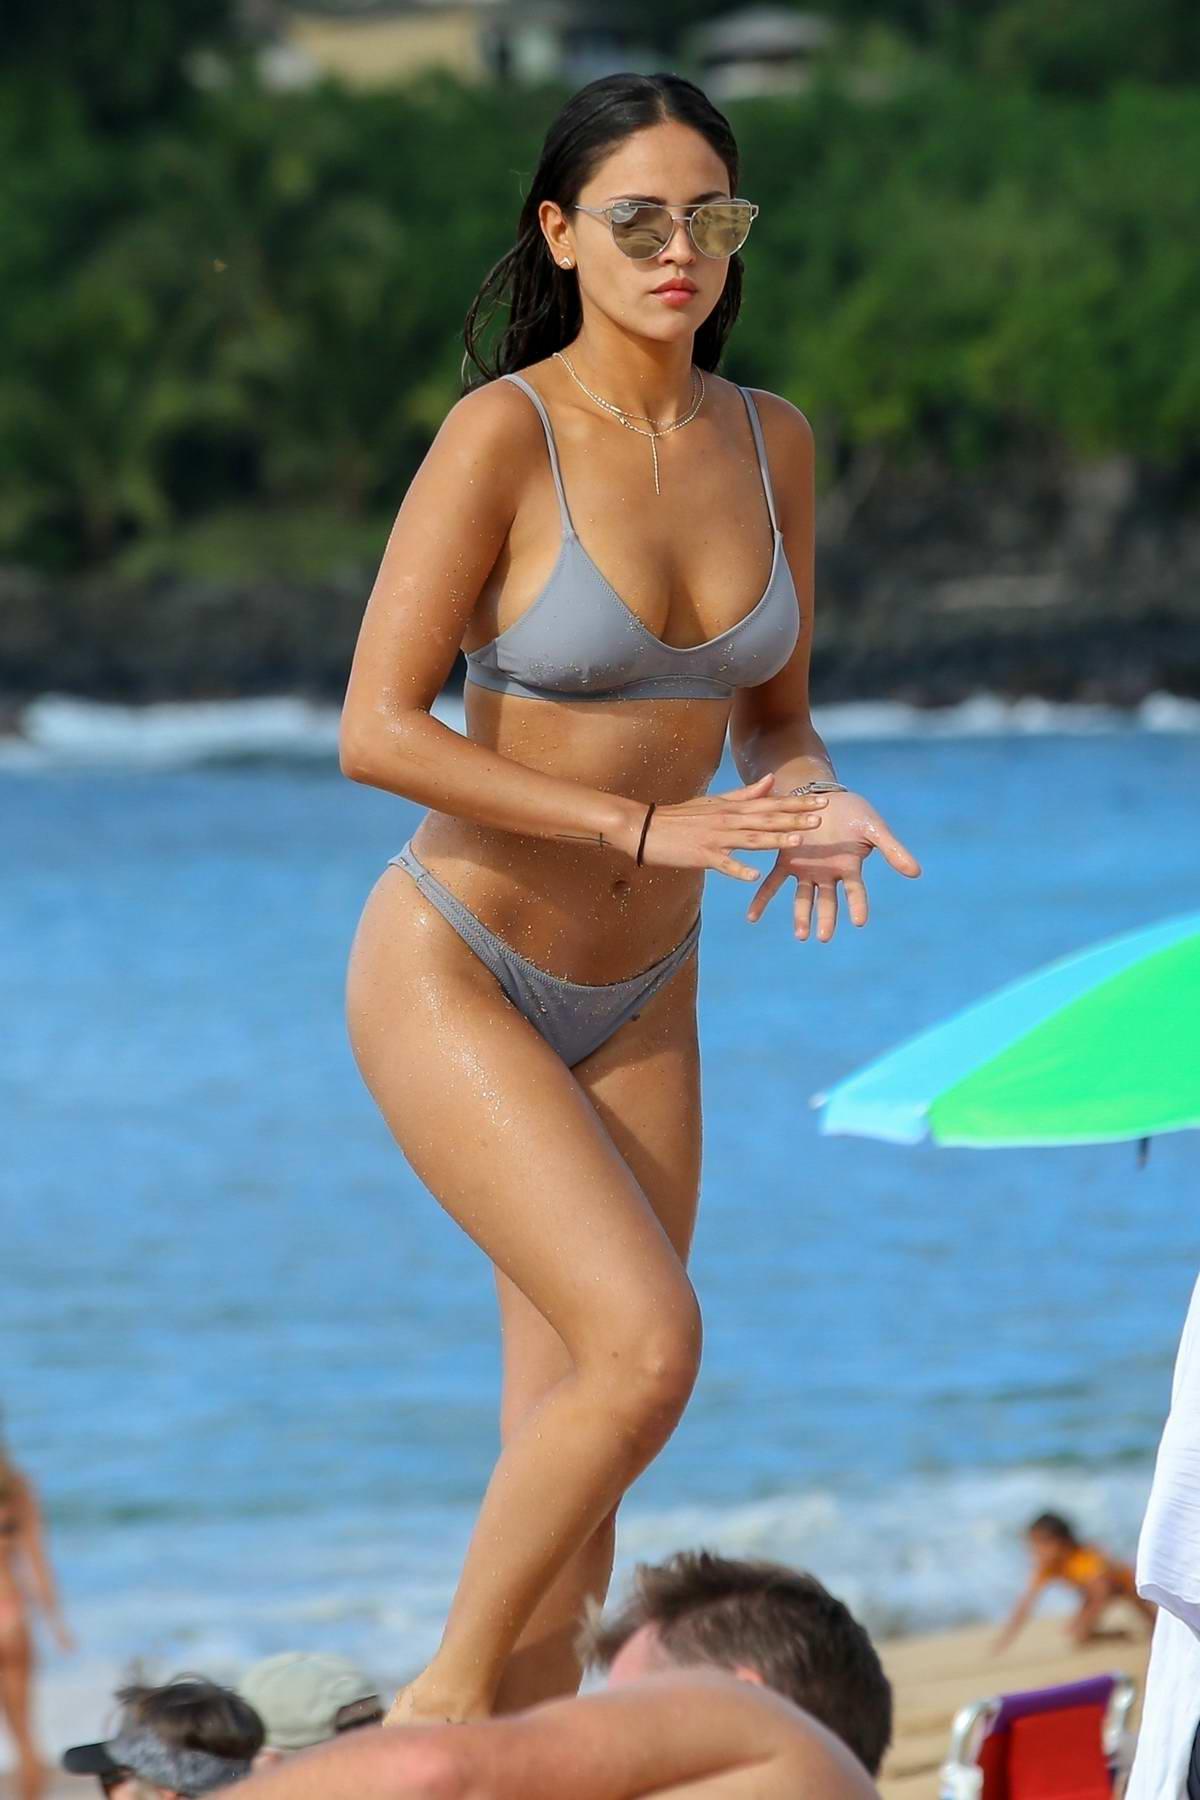 Eiza Gonzalez stuns in a silver bikini while enjoying a day at the beach in North Shore, Oahu, Hawaii